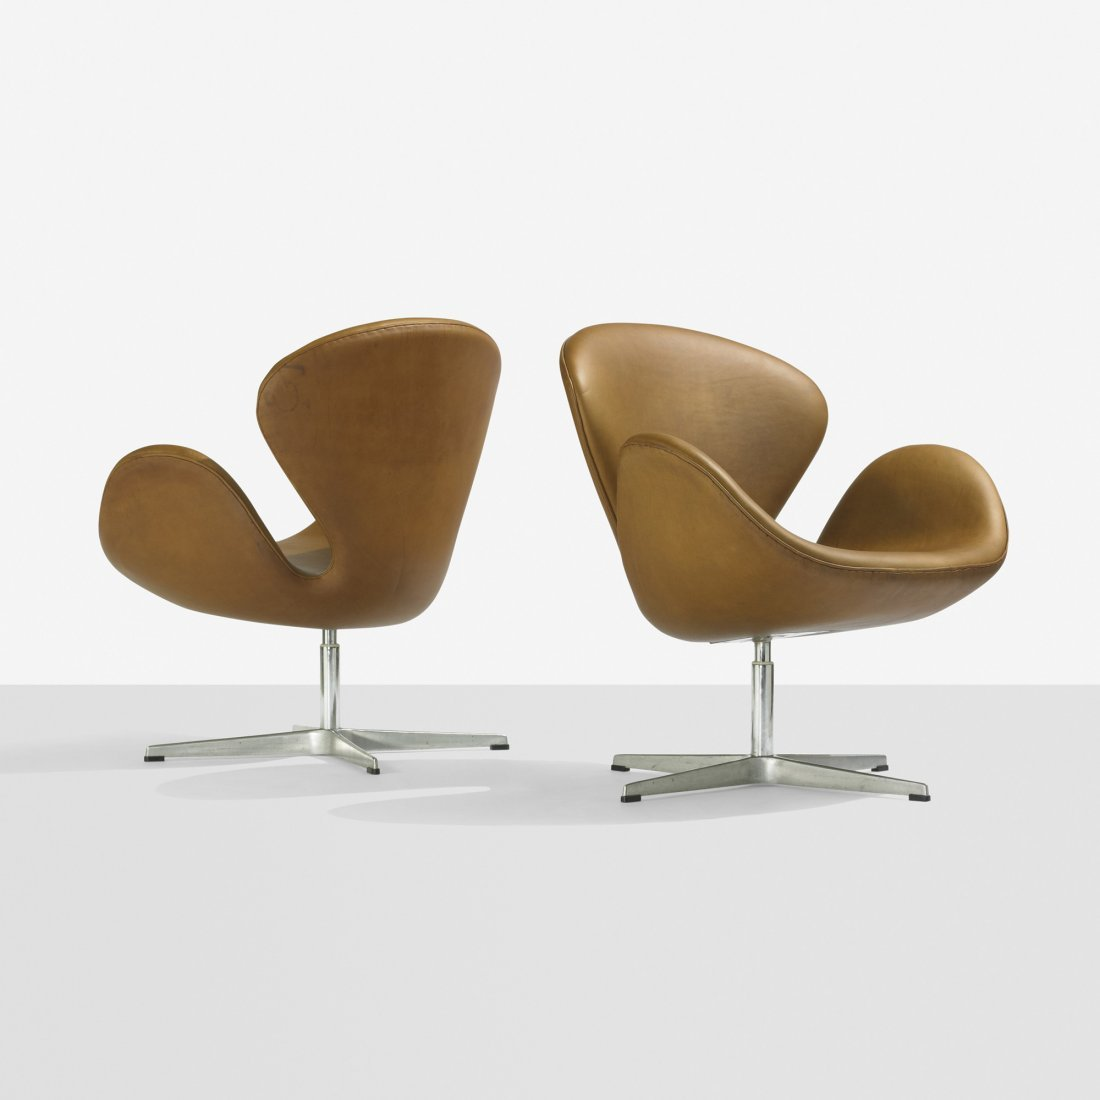 207: Arne Jacobsen Swan chairs, par